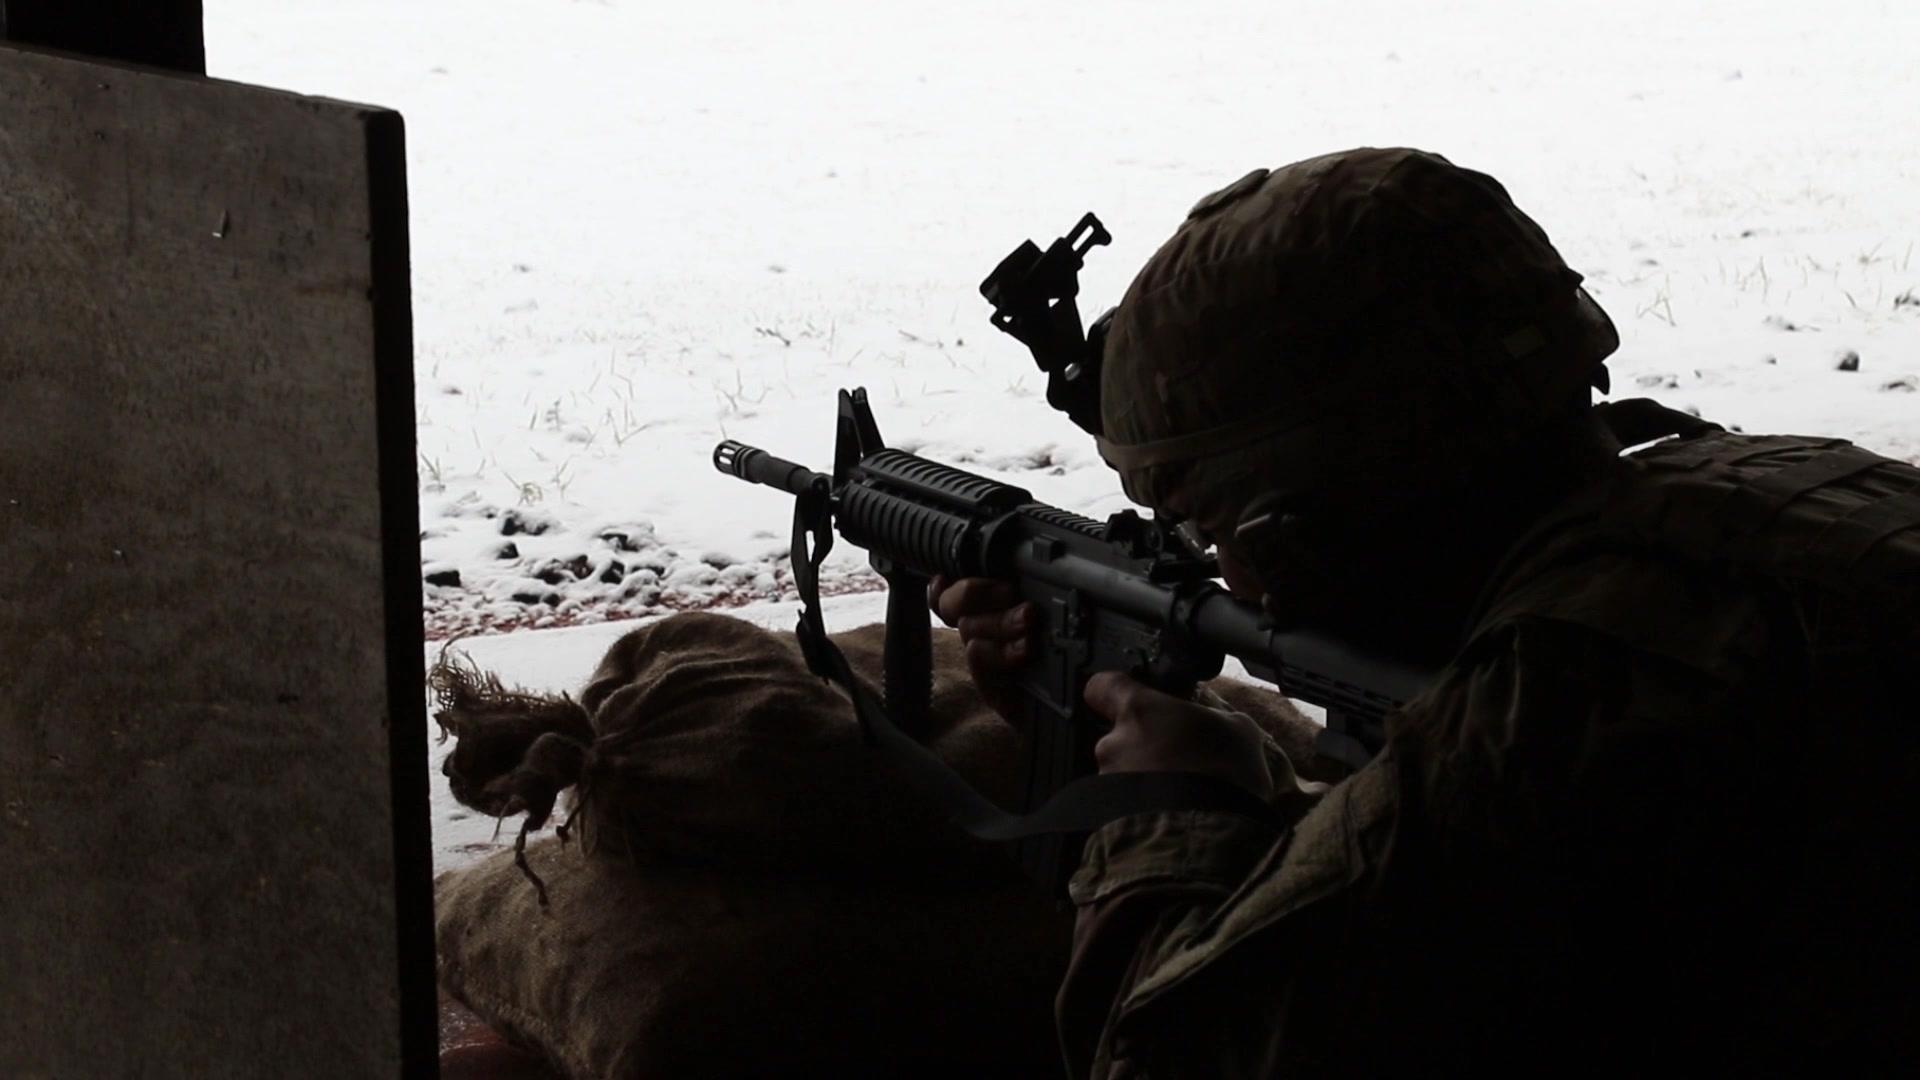 361st Civil Affairs Brigade Trains on Warrior Tasks